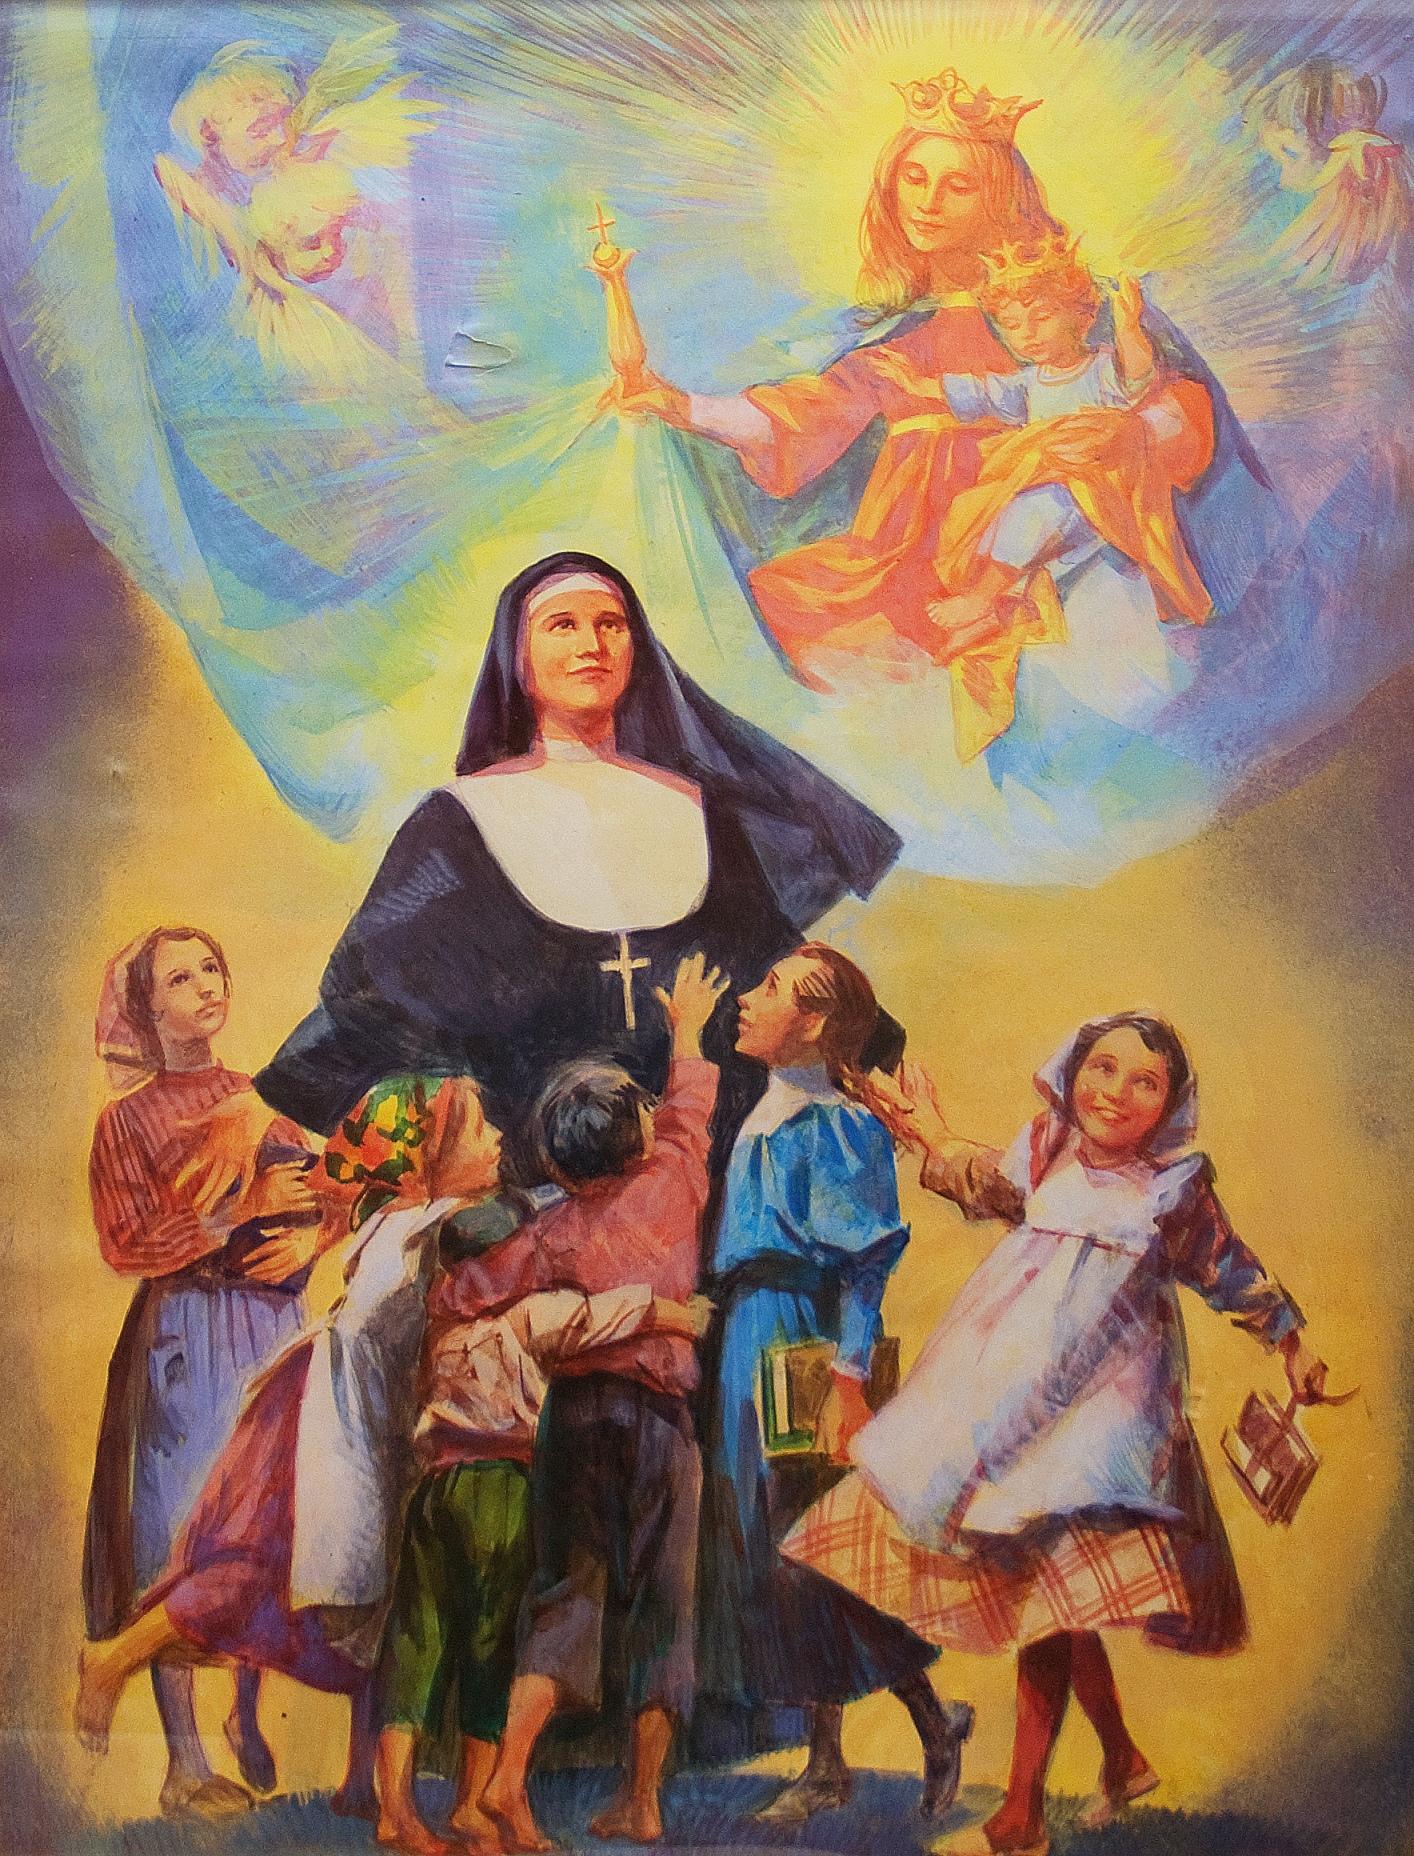 Une image de Maddalena Morano